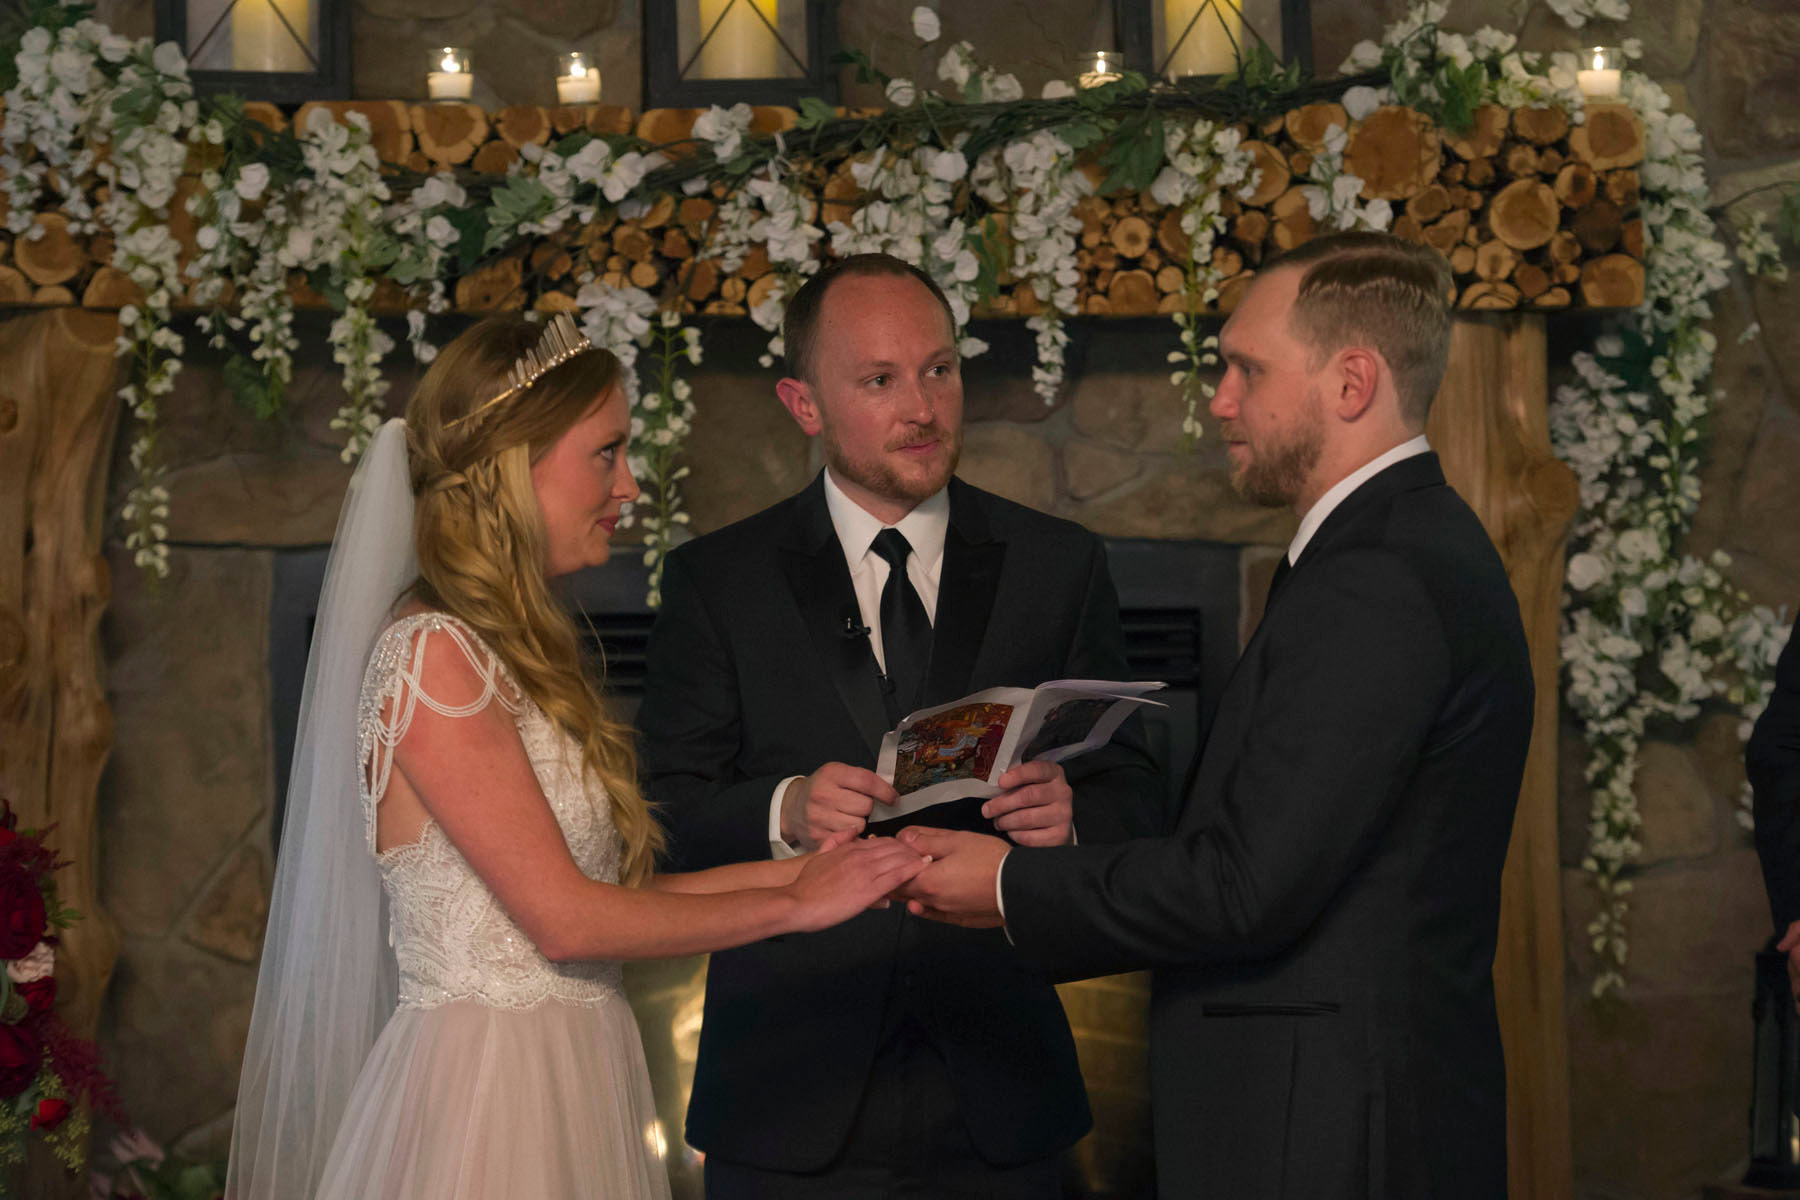 Bucks_County_wedding_photographer_Stroudsmoor_country_inn_wedding_Philadelphia_wedding_photographer_18_bride_and_groom_sharing_vows.JPG